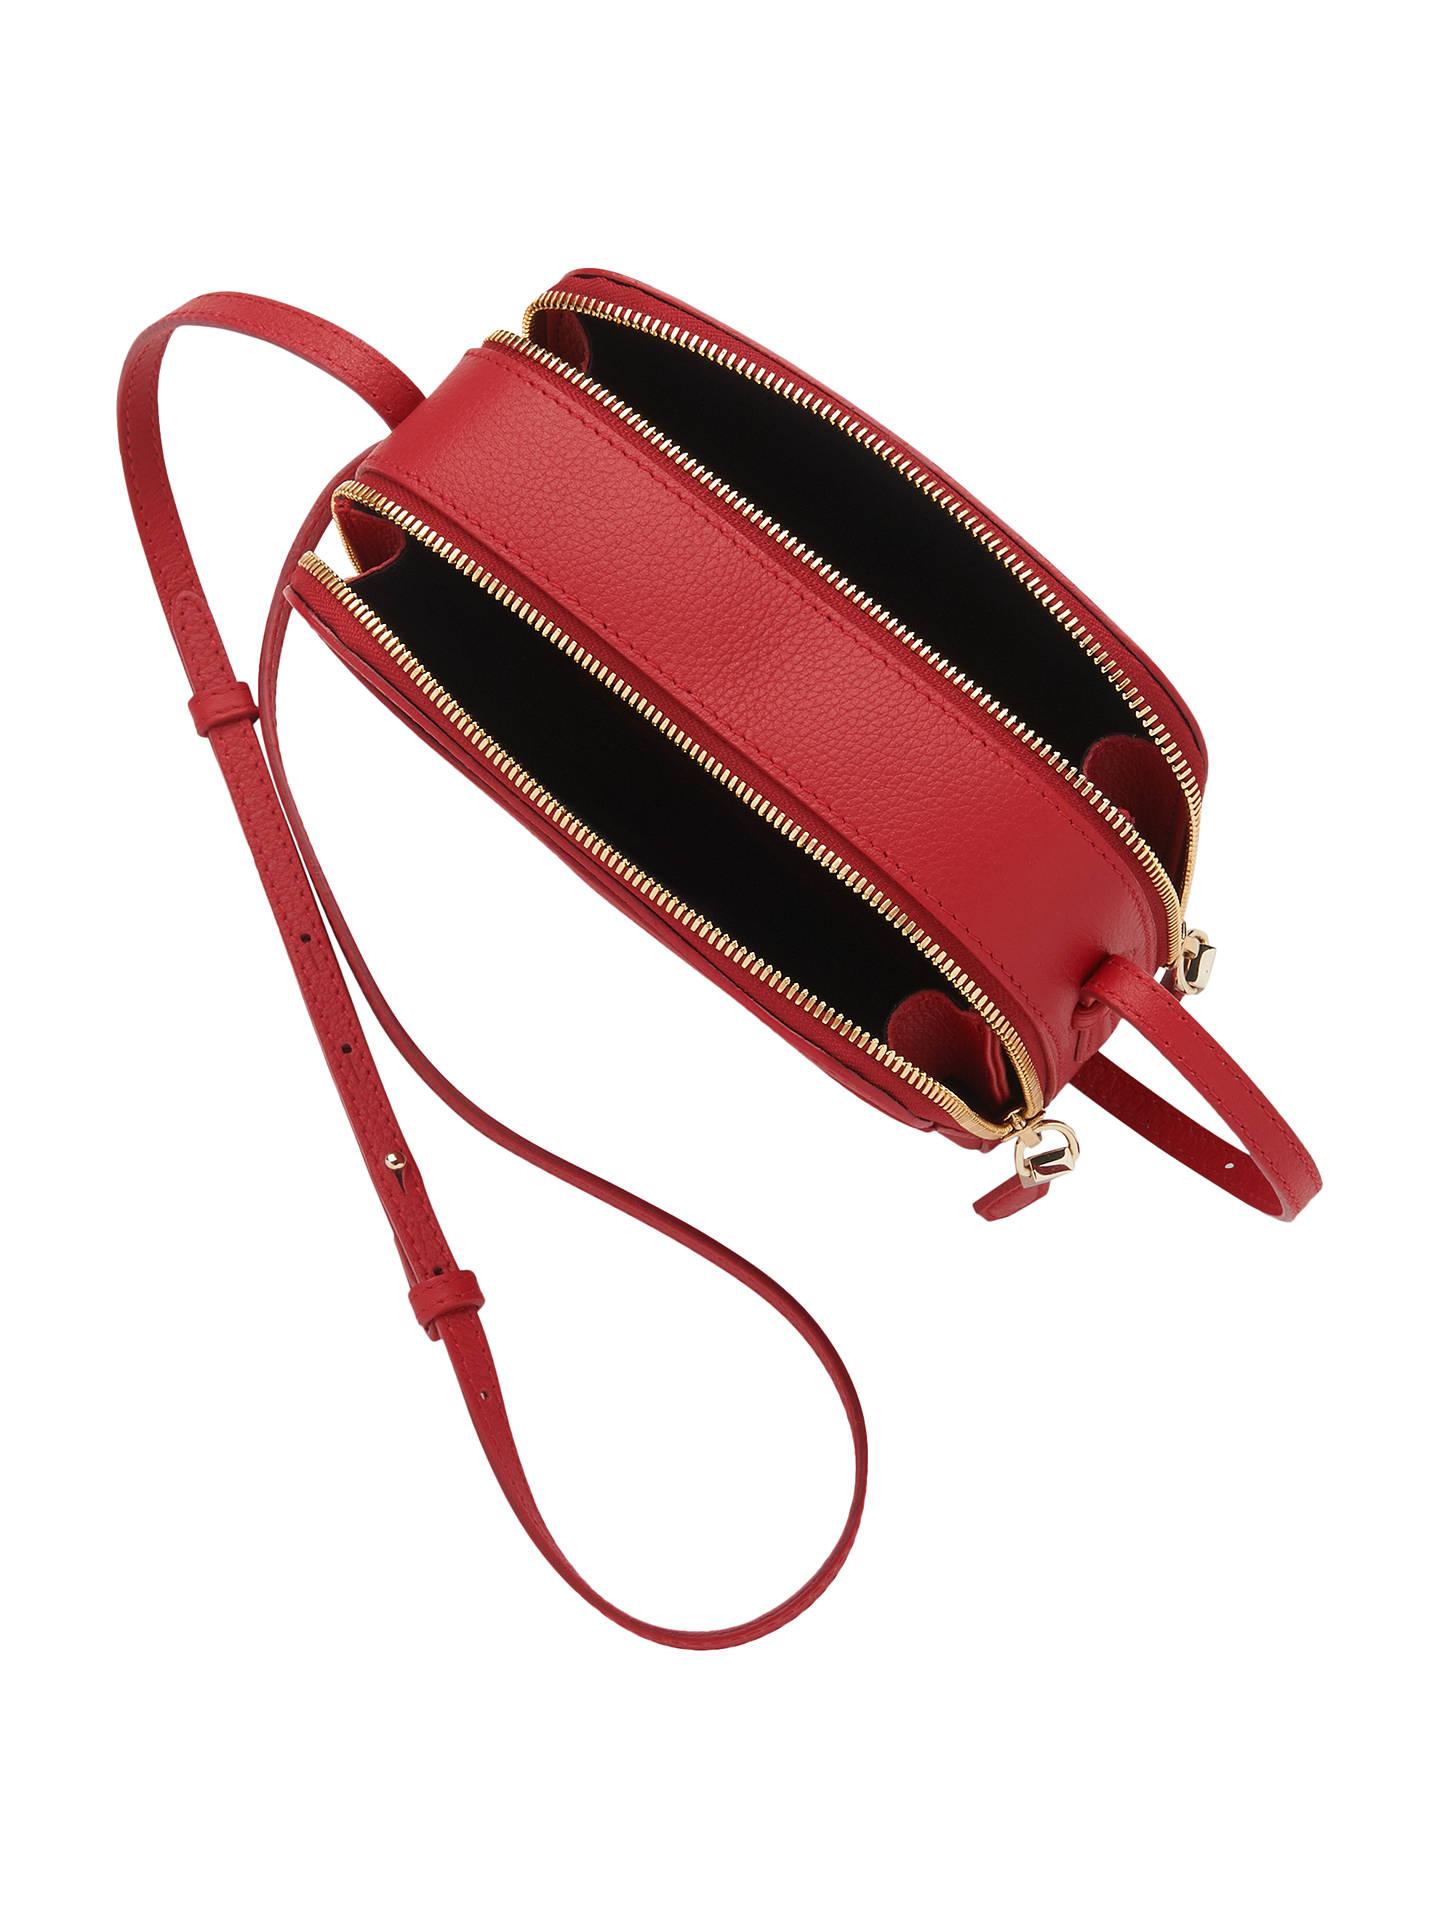 ec5bf72f6998 ... Buy L.K.Bennett Mariel Leather Cross Body Bag, Red Online at  johnlewis.com ...